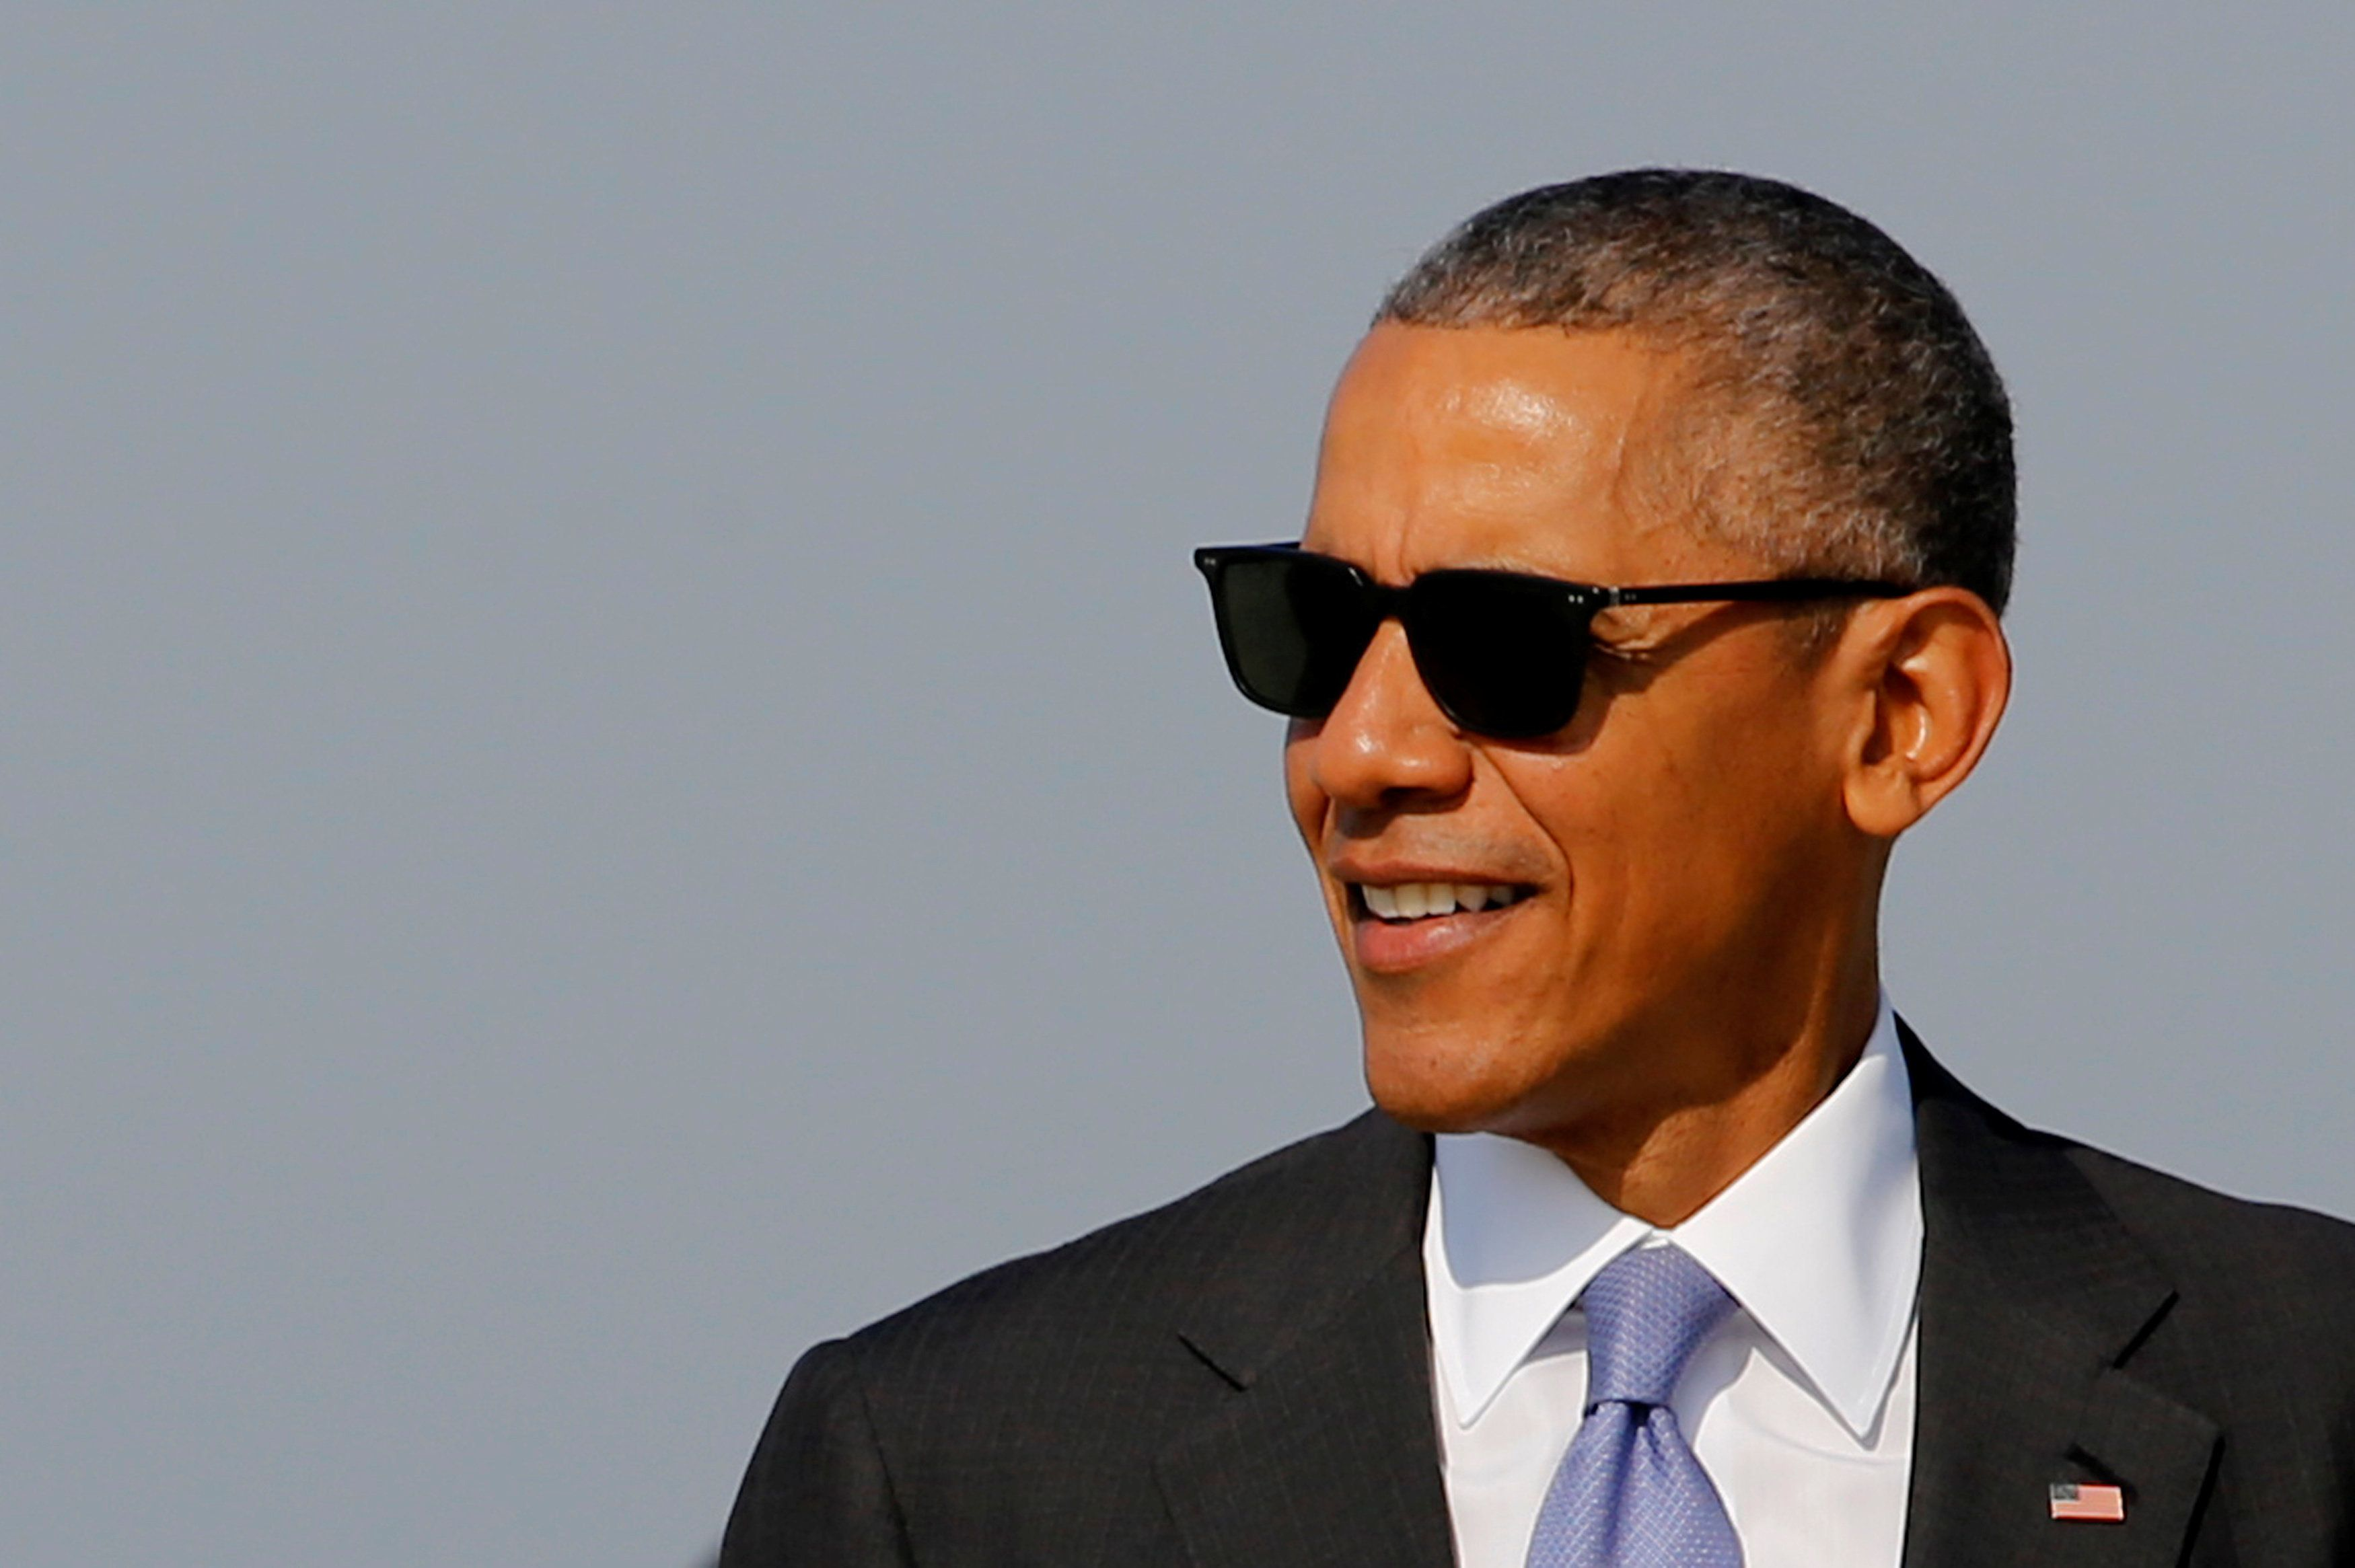 U.S. President Barack Obama arrives to board Air Force One for travel to North Carolina from Joint Base Andrews, Maryland, U.S. November 2, 2016. REUTERS/Jonathan Ernst